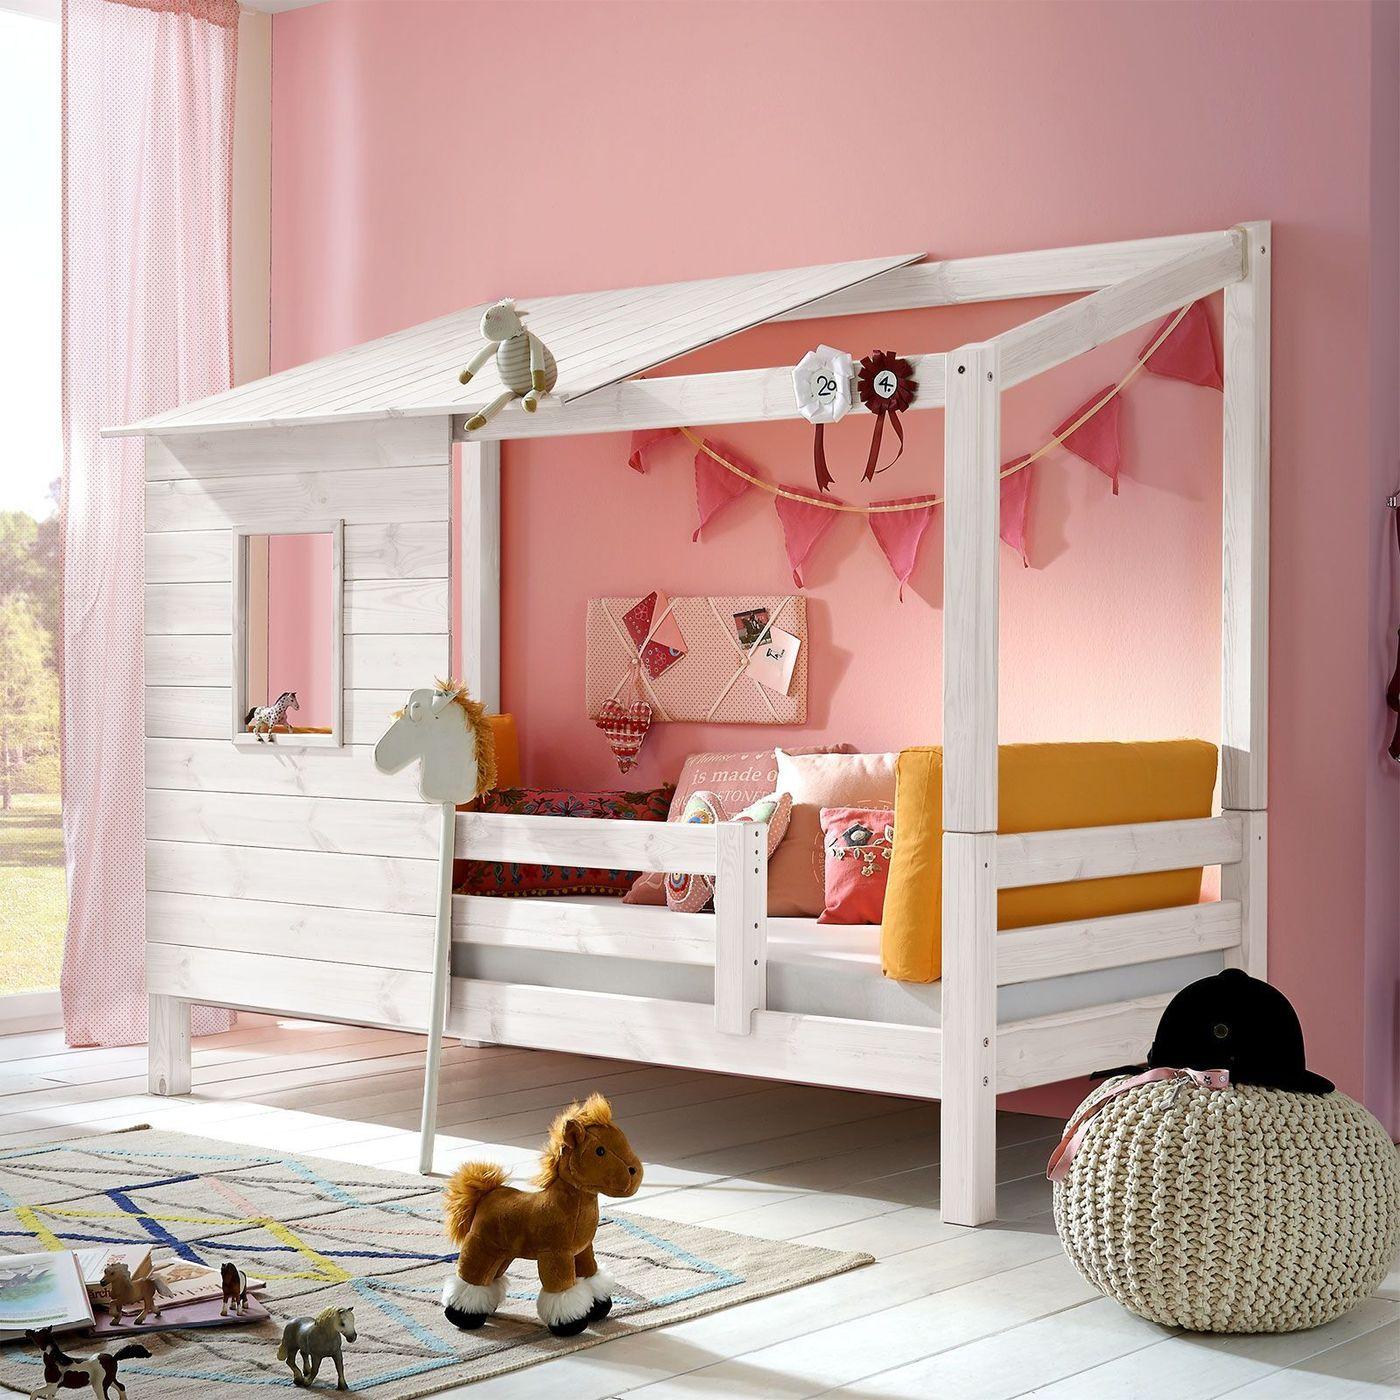 Full Size of Bett Mädchen Betten Wohnzimmer Kinderbett Mädchen